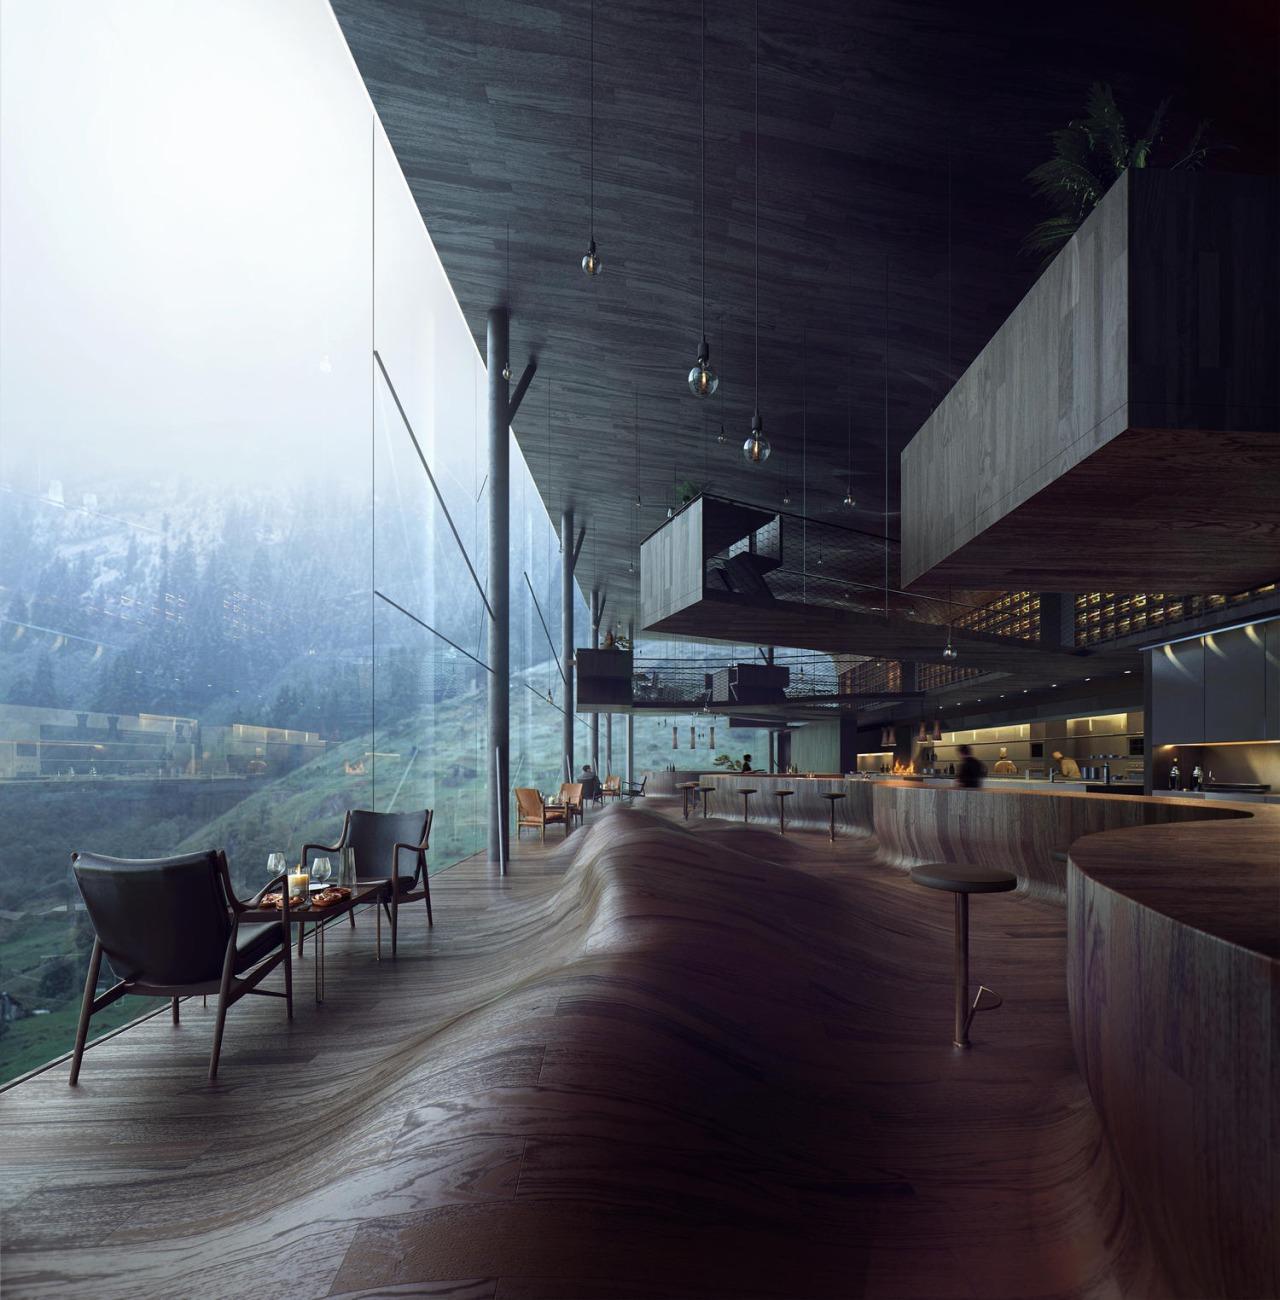 restaurant by jensen skodvin architects Tumblr Collection #13